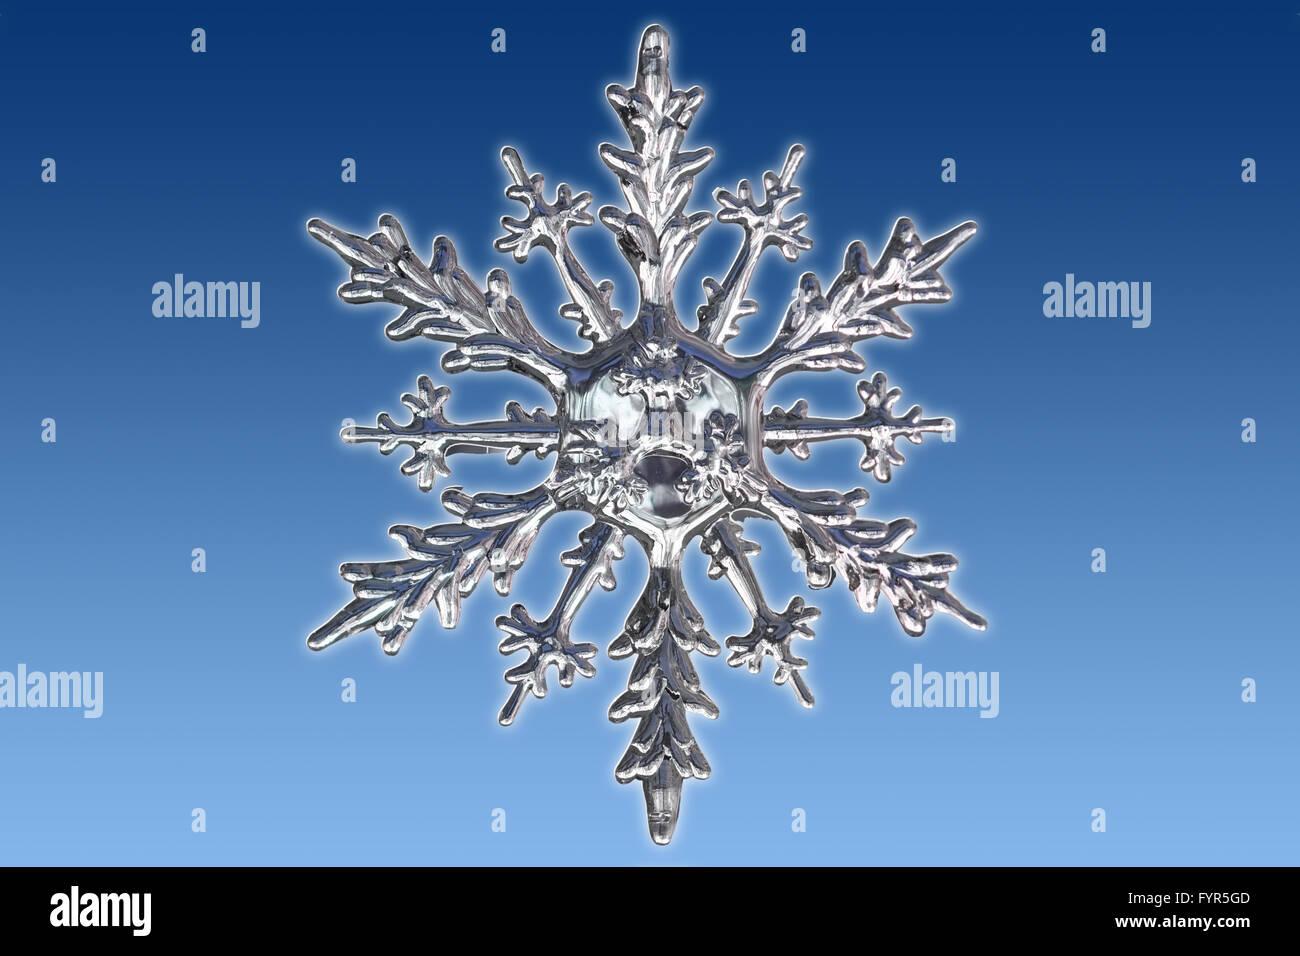 Snowflake - Stock Image